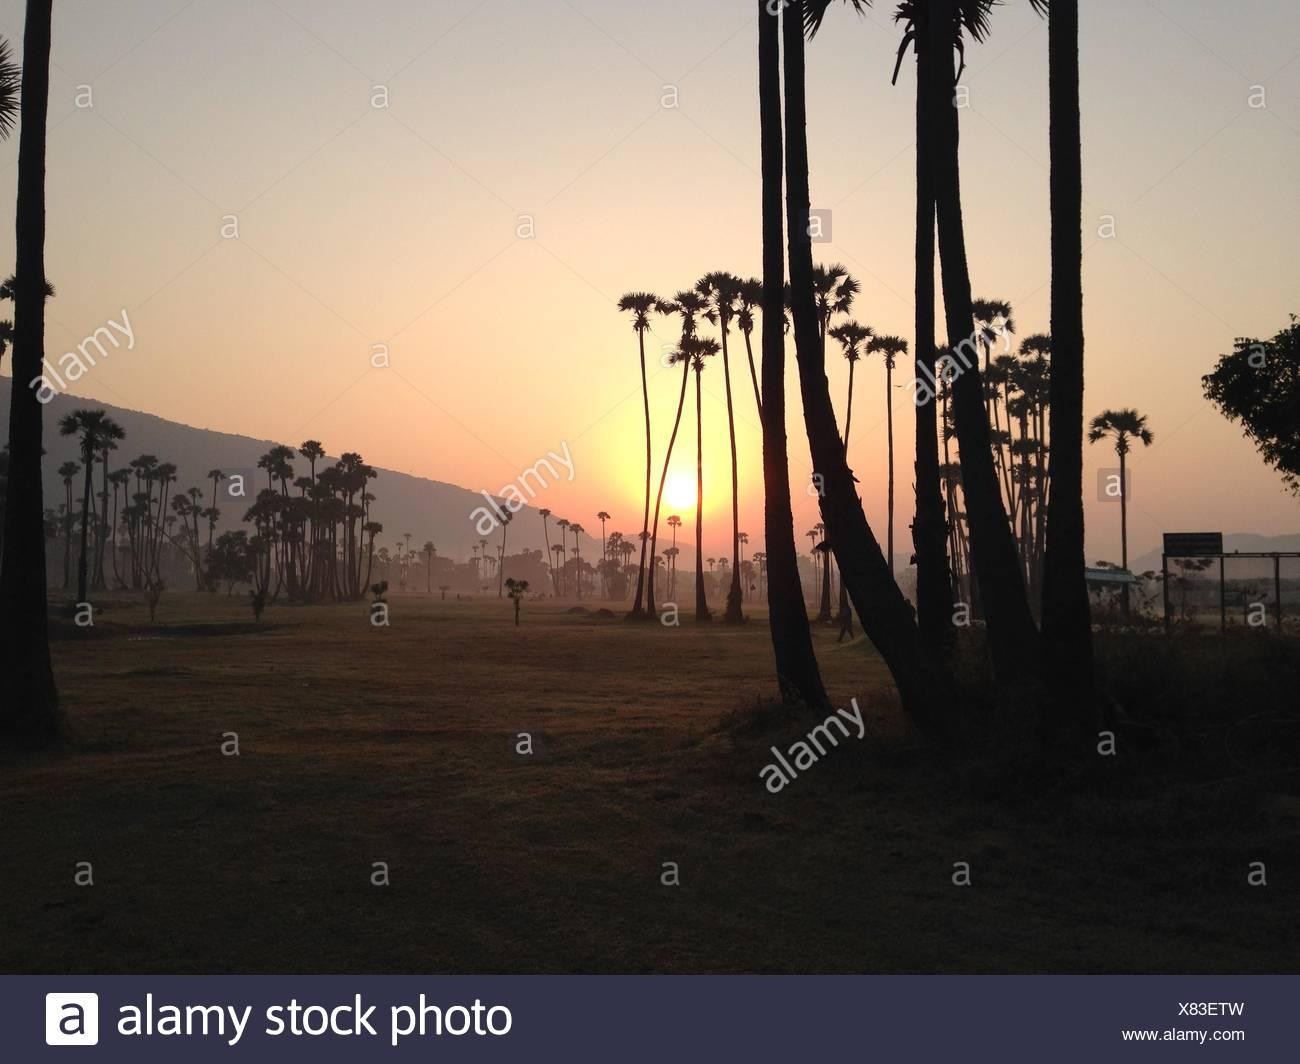 Indien, Andhra Pradesh, Vishakhapatnam, Vishakapatnam Bypass, Sonnenaufgang über Palmen Stockbild